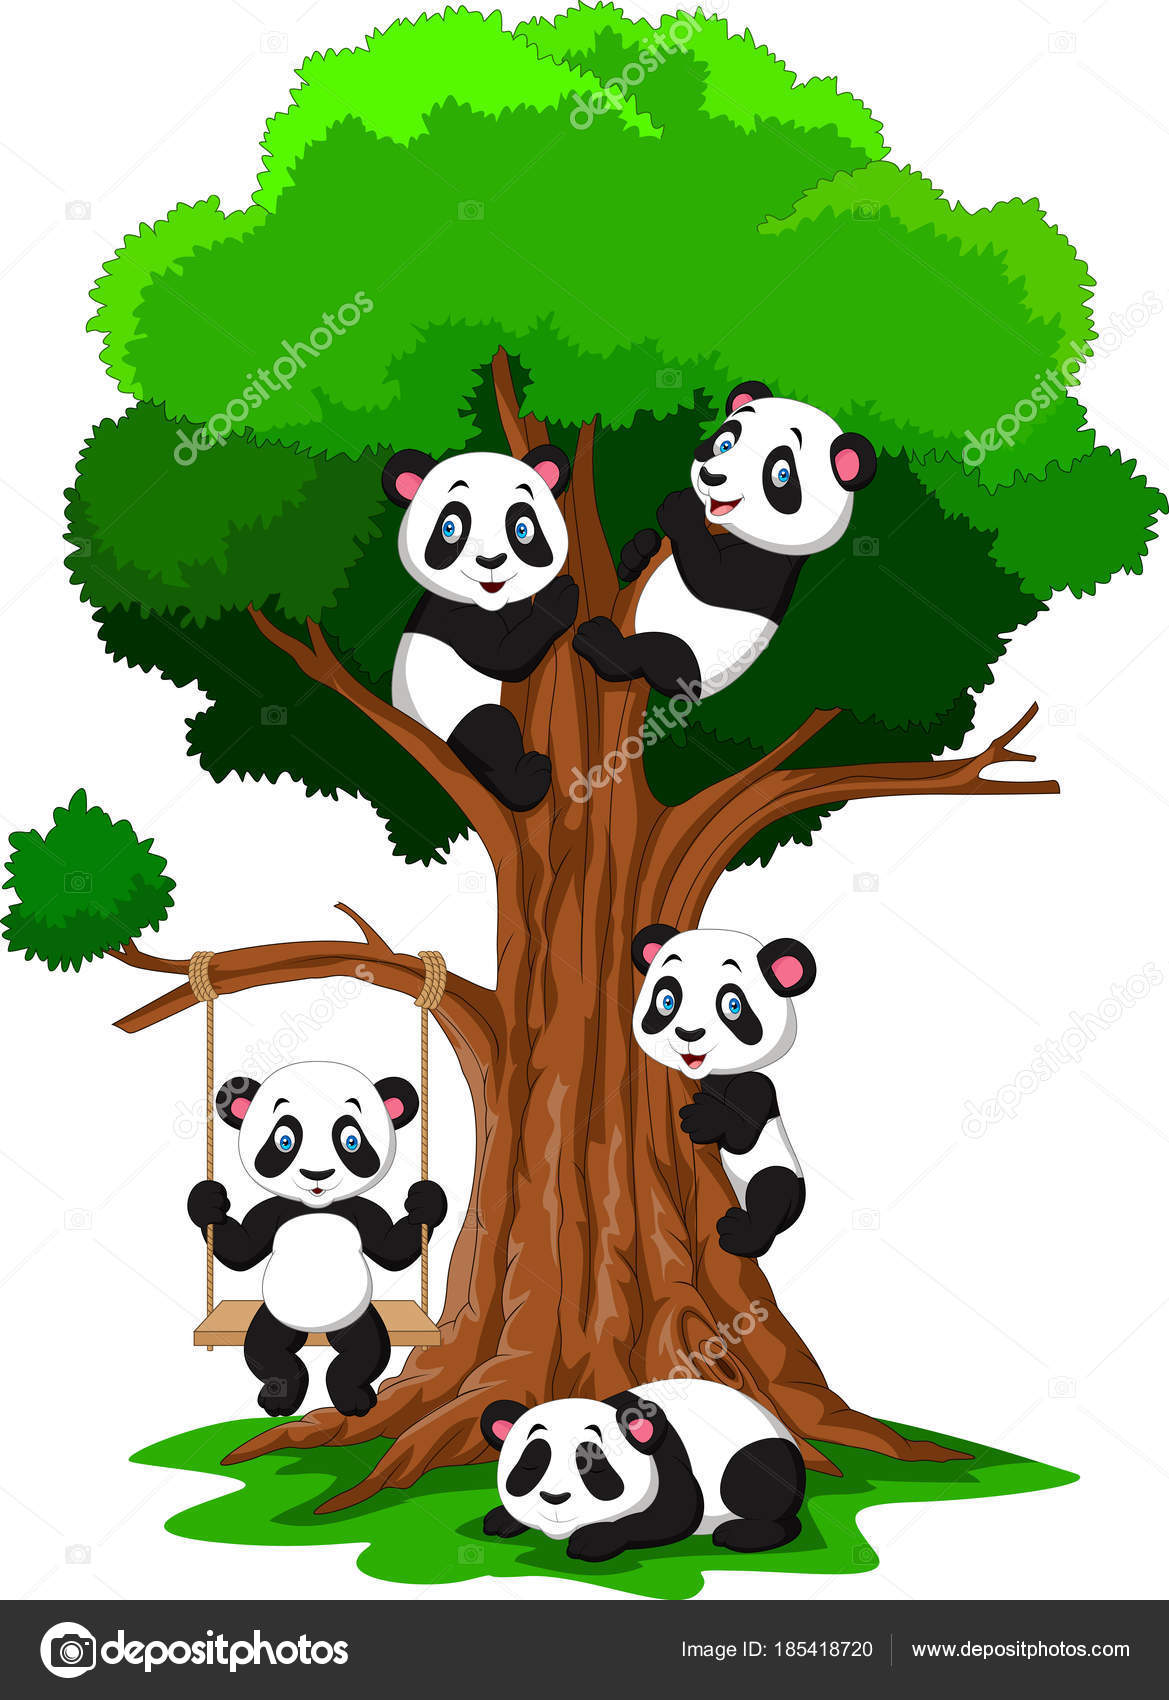 Baby Panda On Tree Cartoon Baby Panda Playing Tree Stock Vector C Tigatelu 185418720